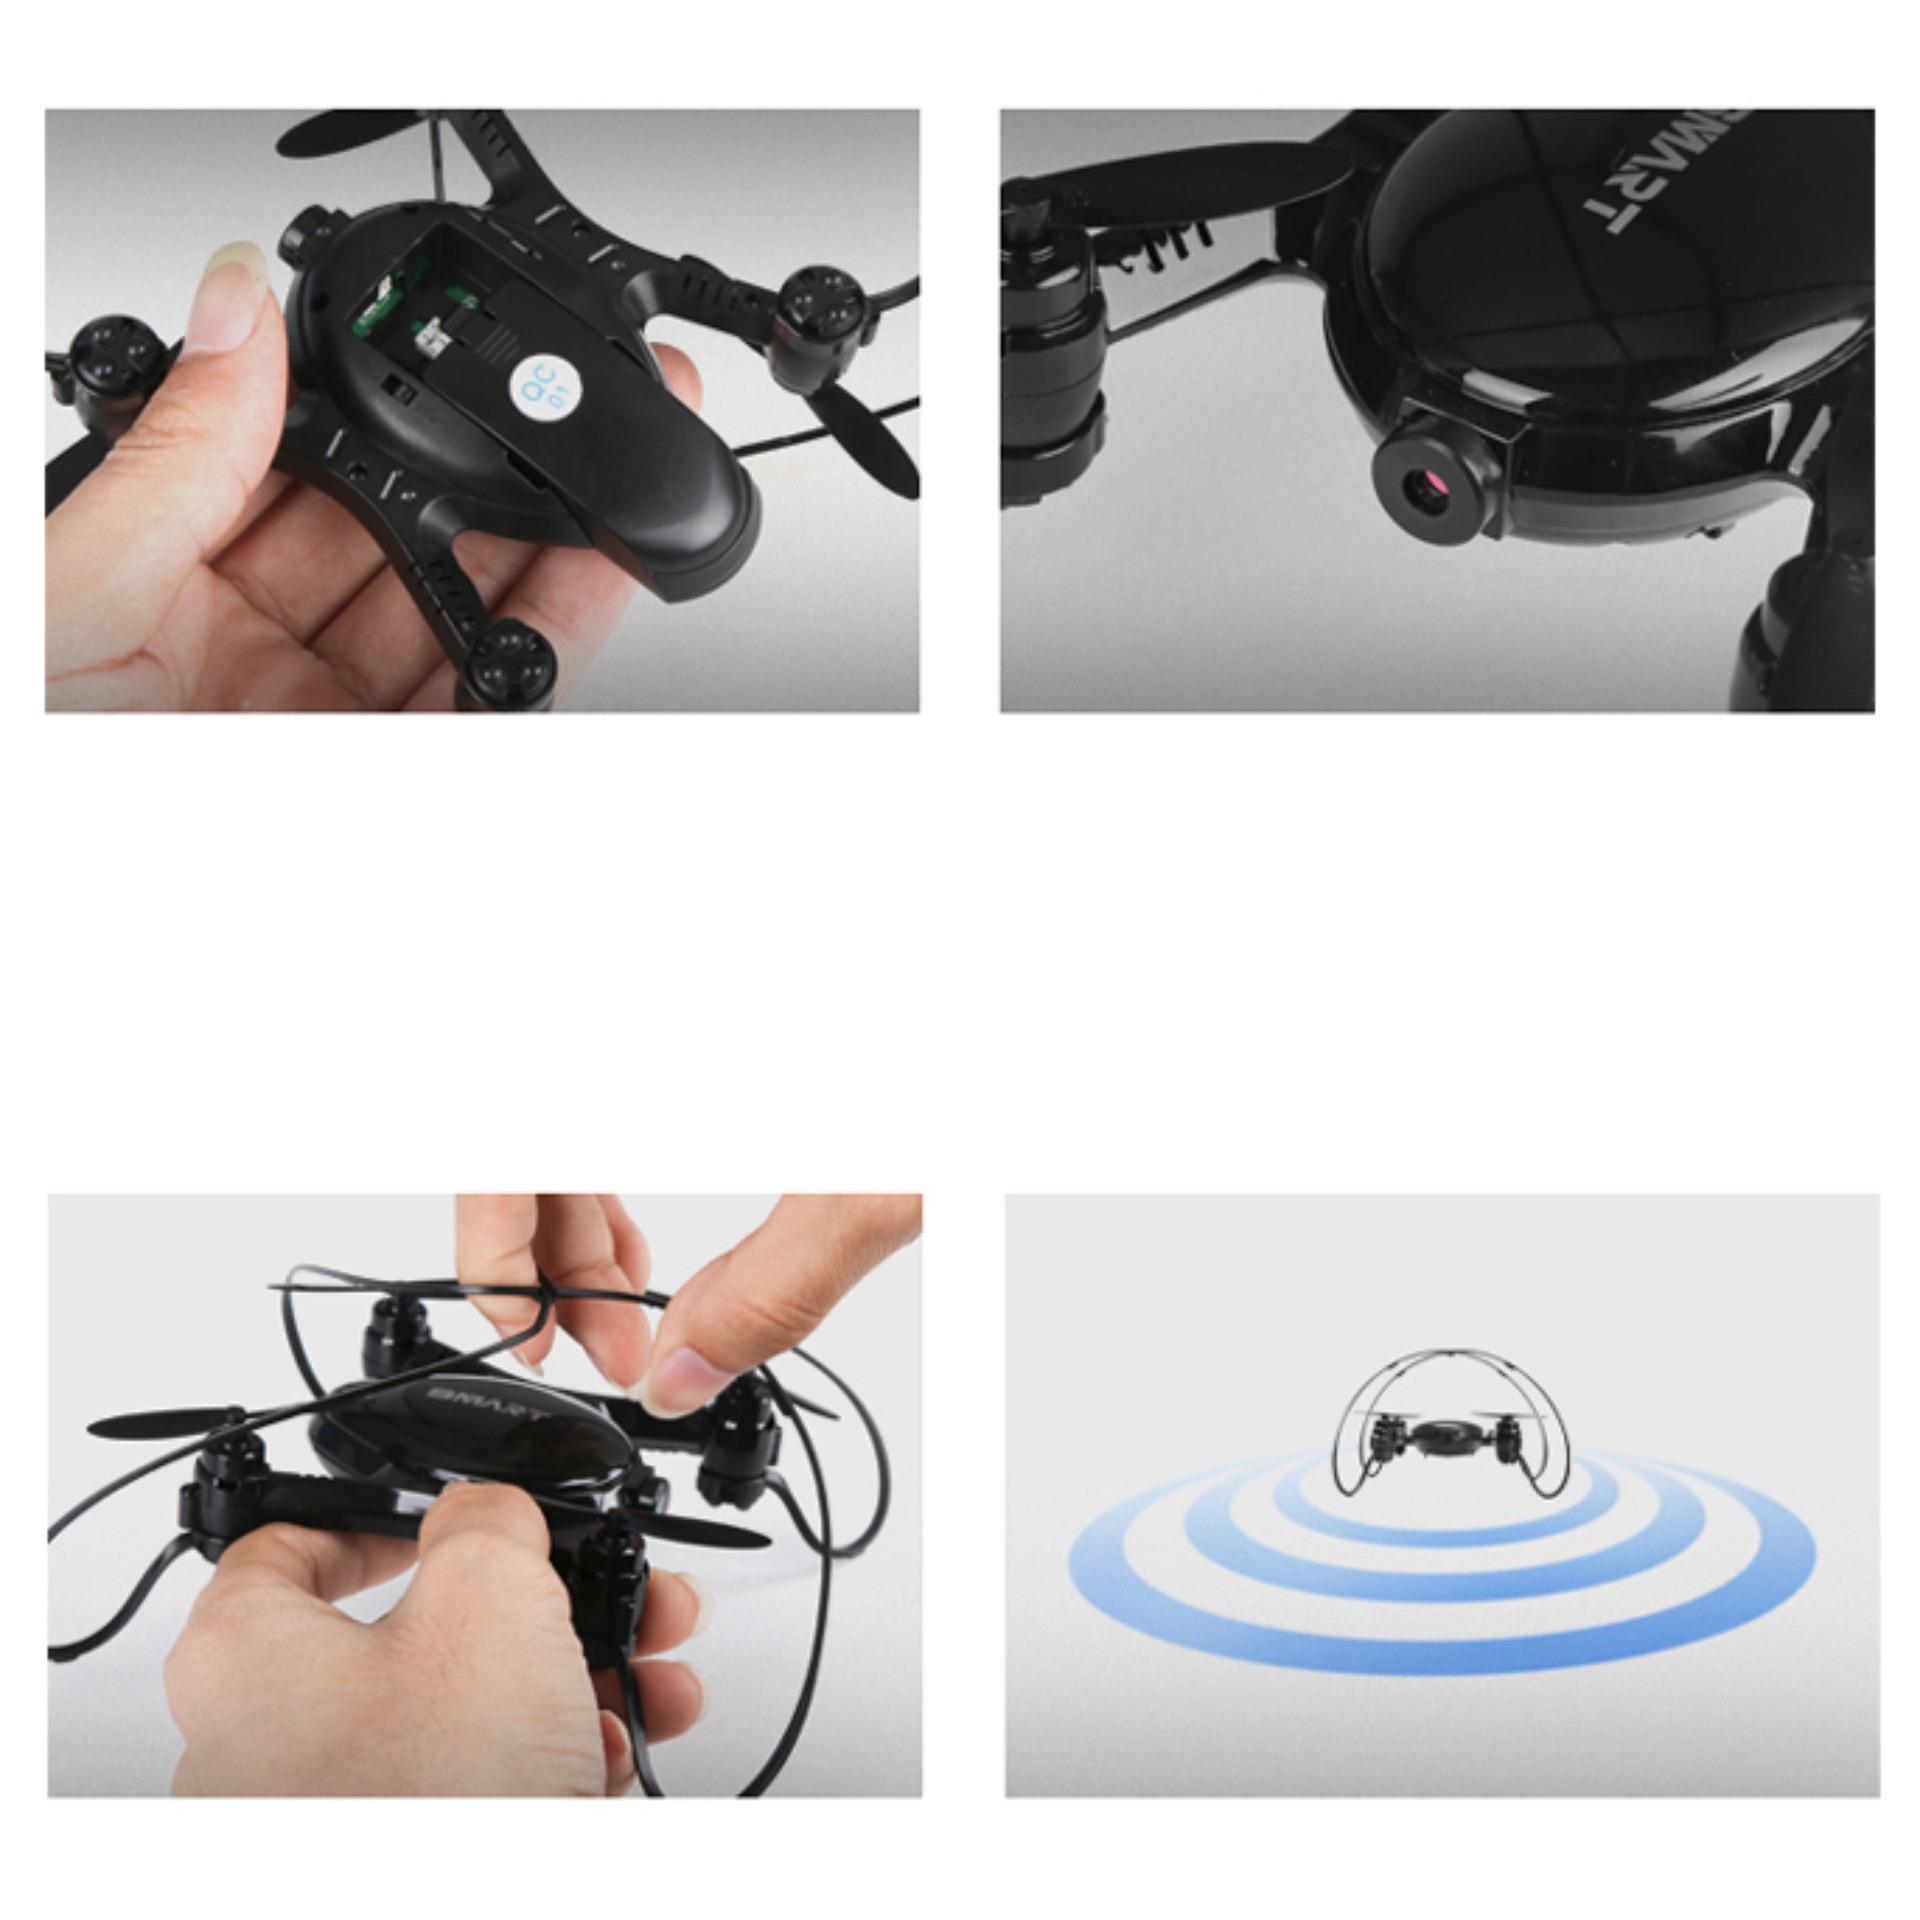 Jjrc H36 Mini Drone Quadcopter 6 Axis 24g 4ch Untuk Rc Mikro Micro Pemula 2 Mode Kecepatan Nihui Nh010 Gyro Pesaing Furibee Eachine E010 E012 Wifi With 03mp Camera Fy603 Putih